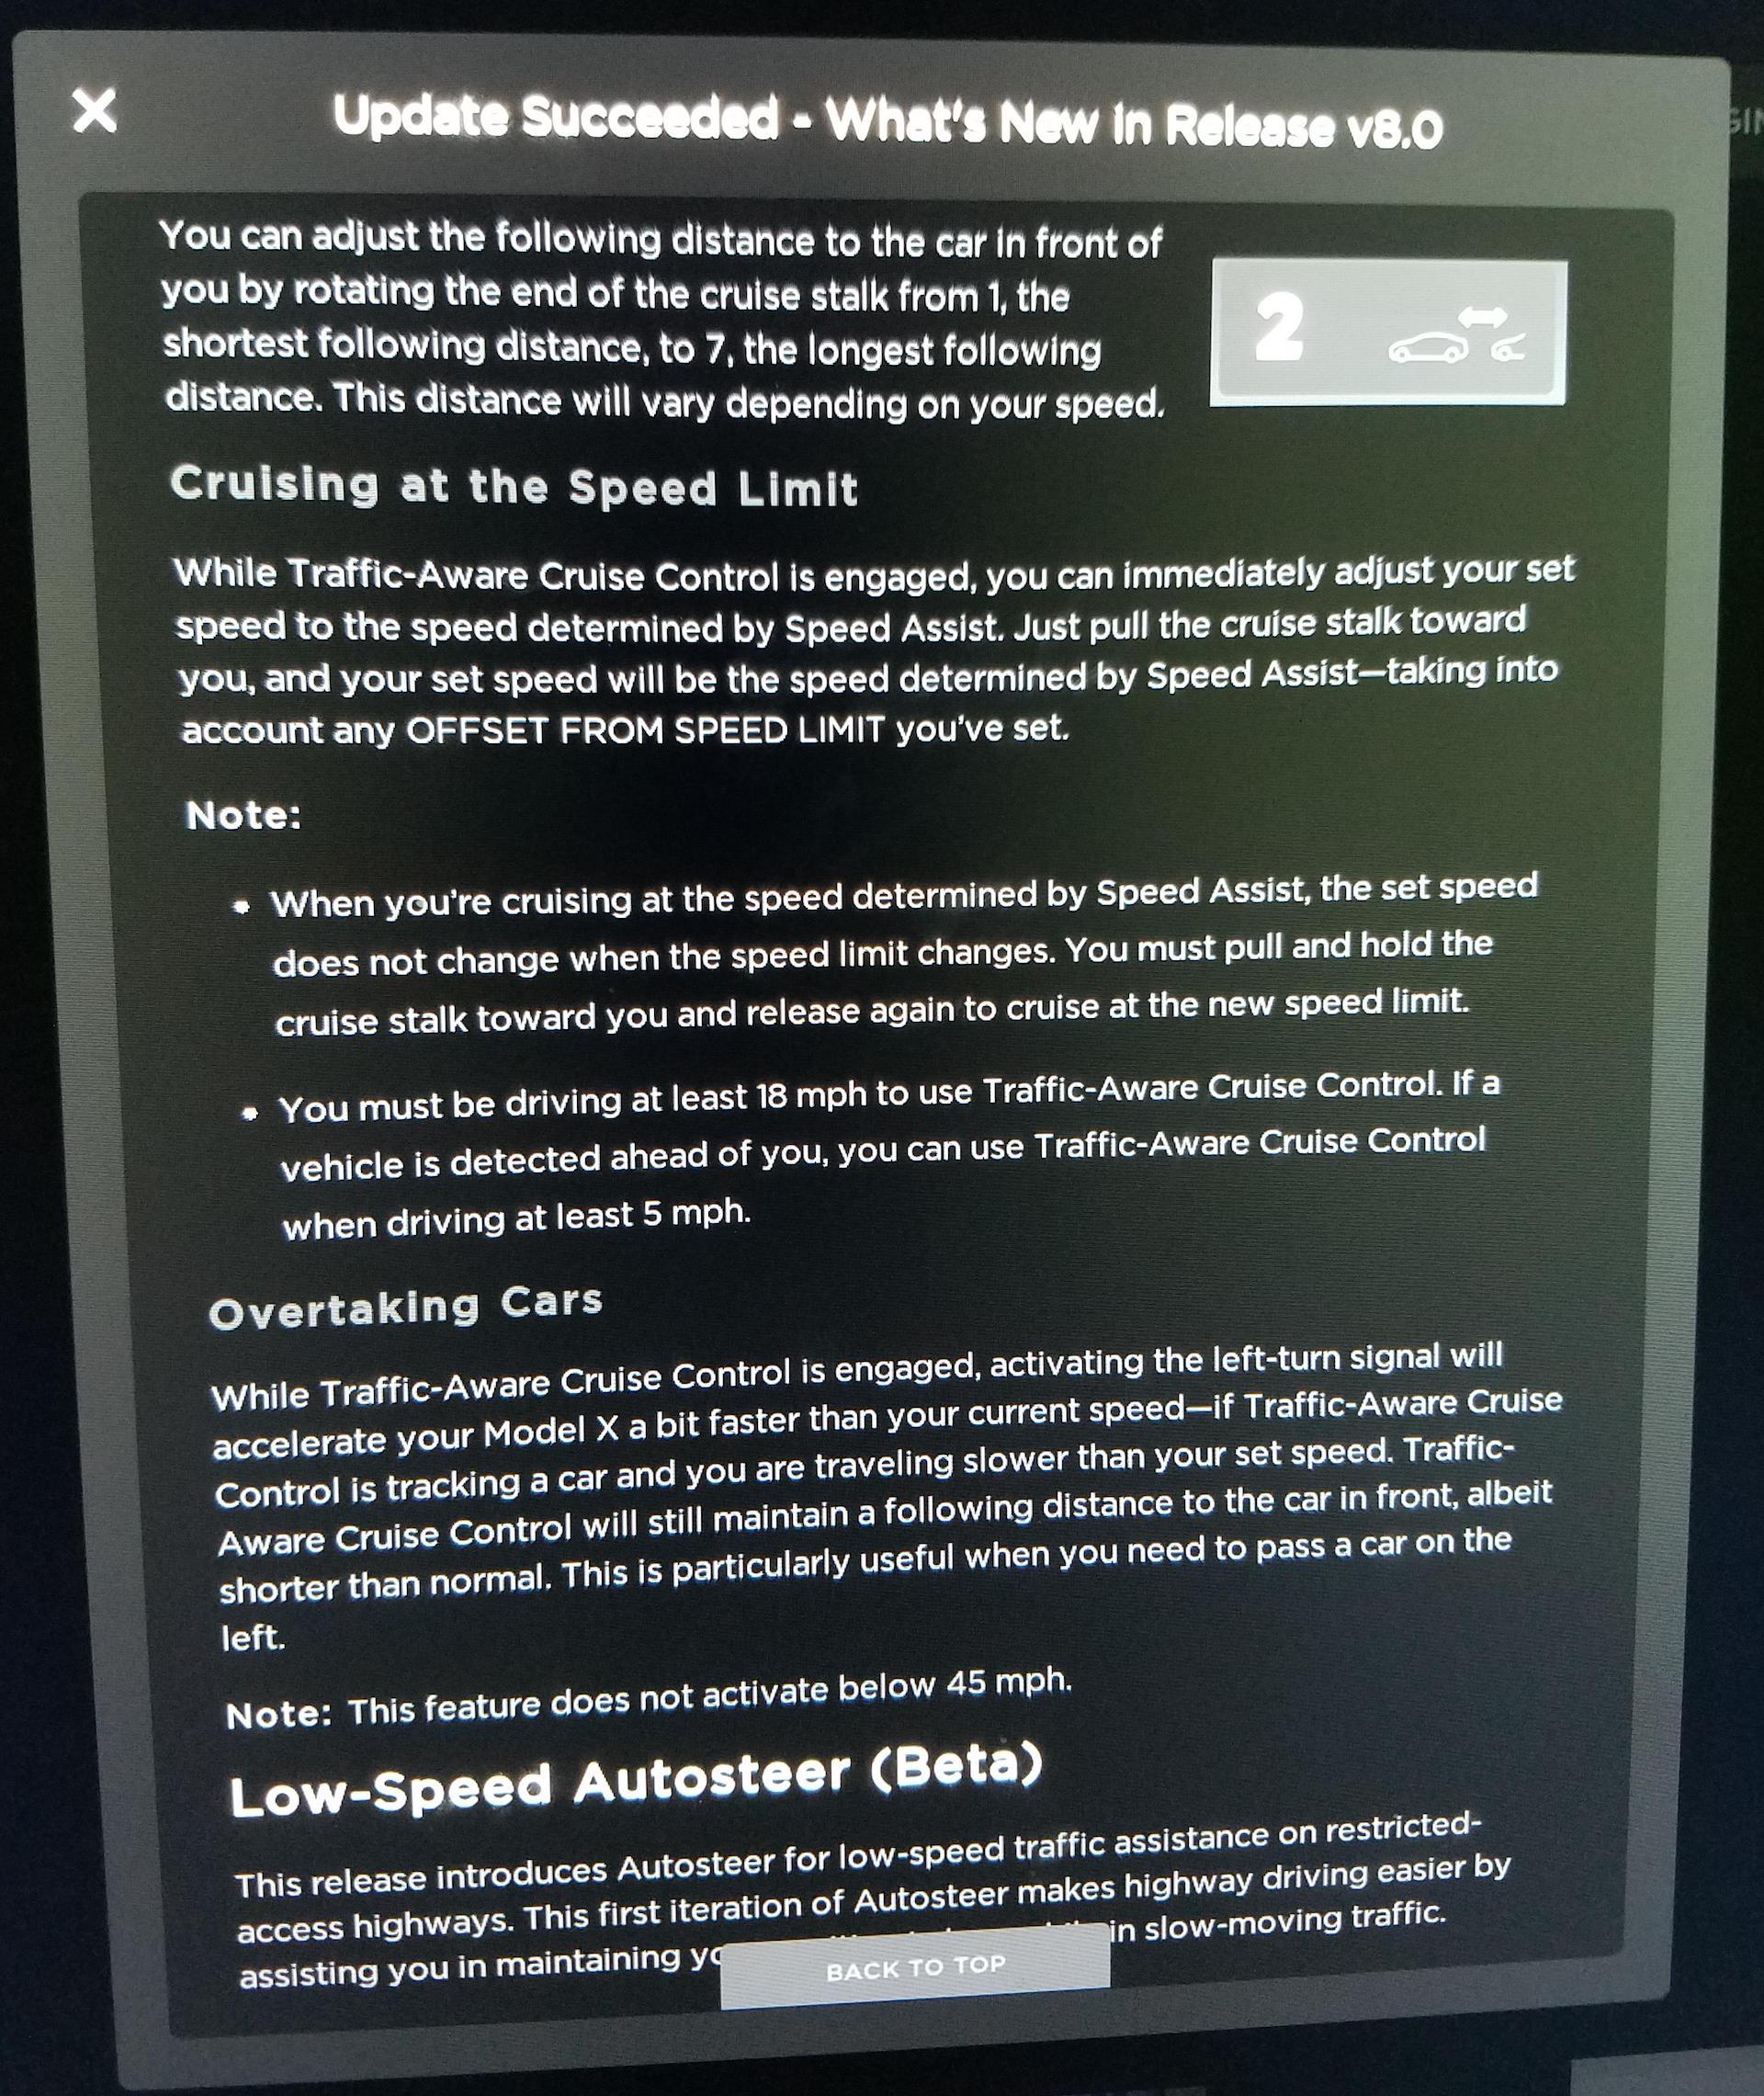 Tesla_Enhanced_Autopilot_release-notes-3